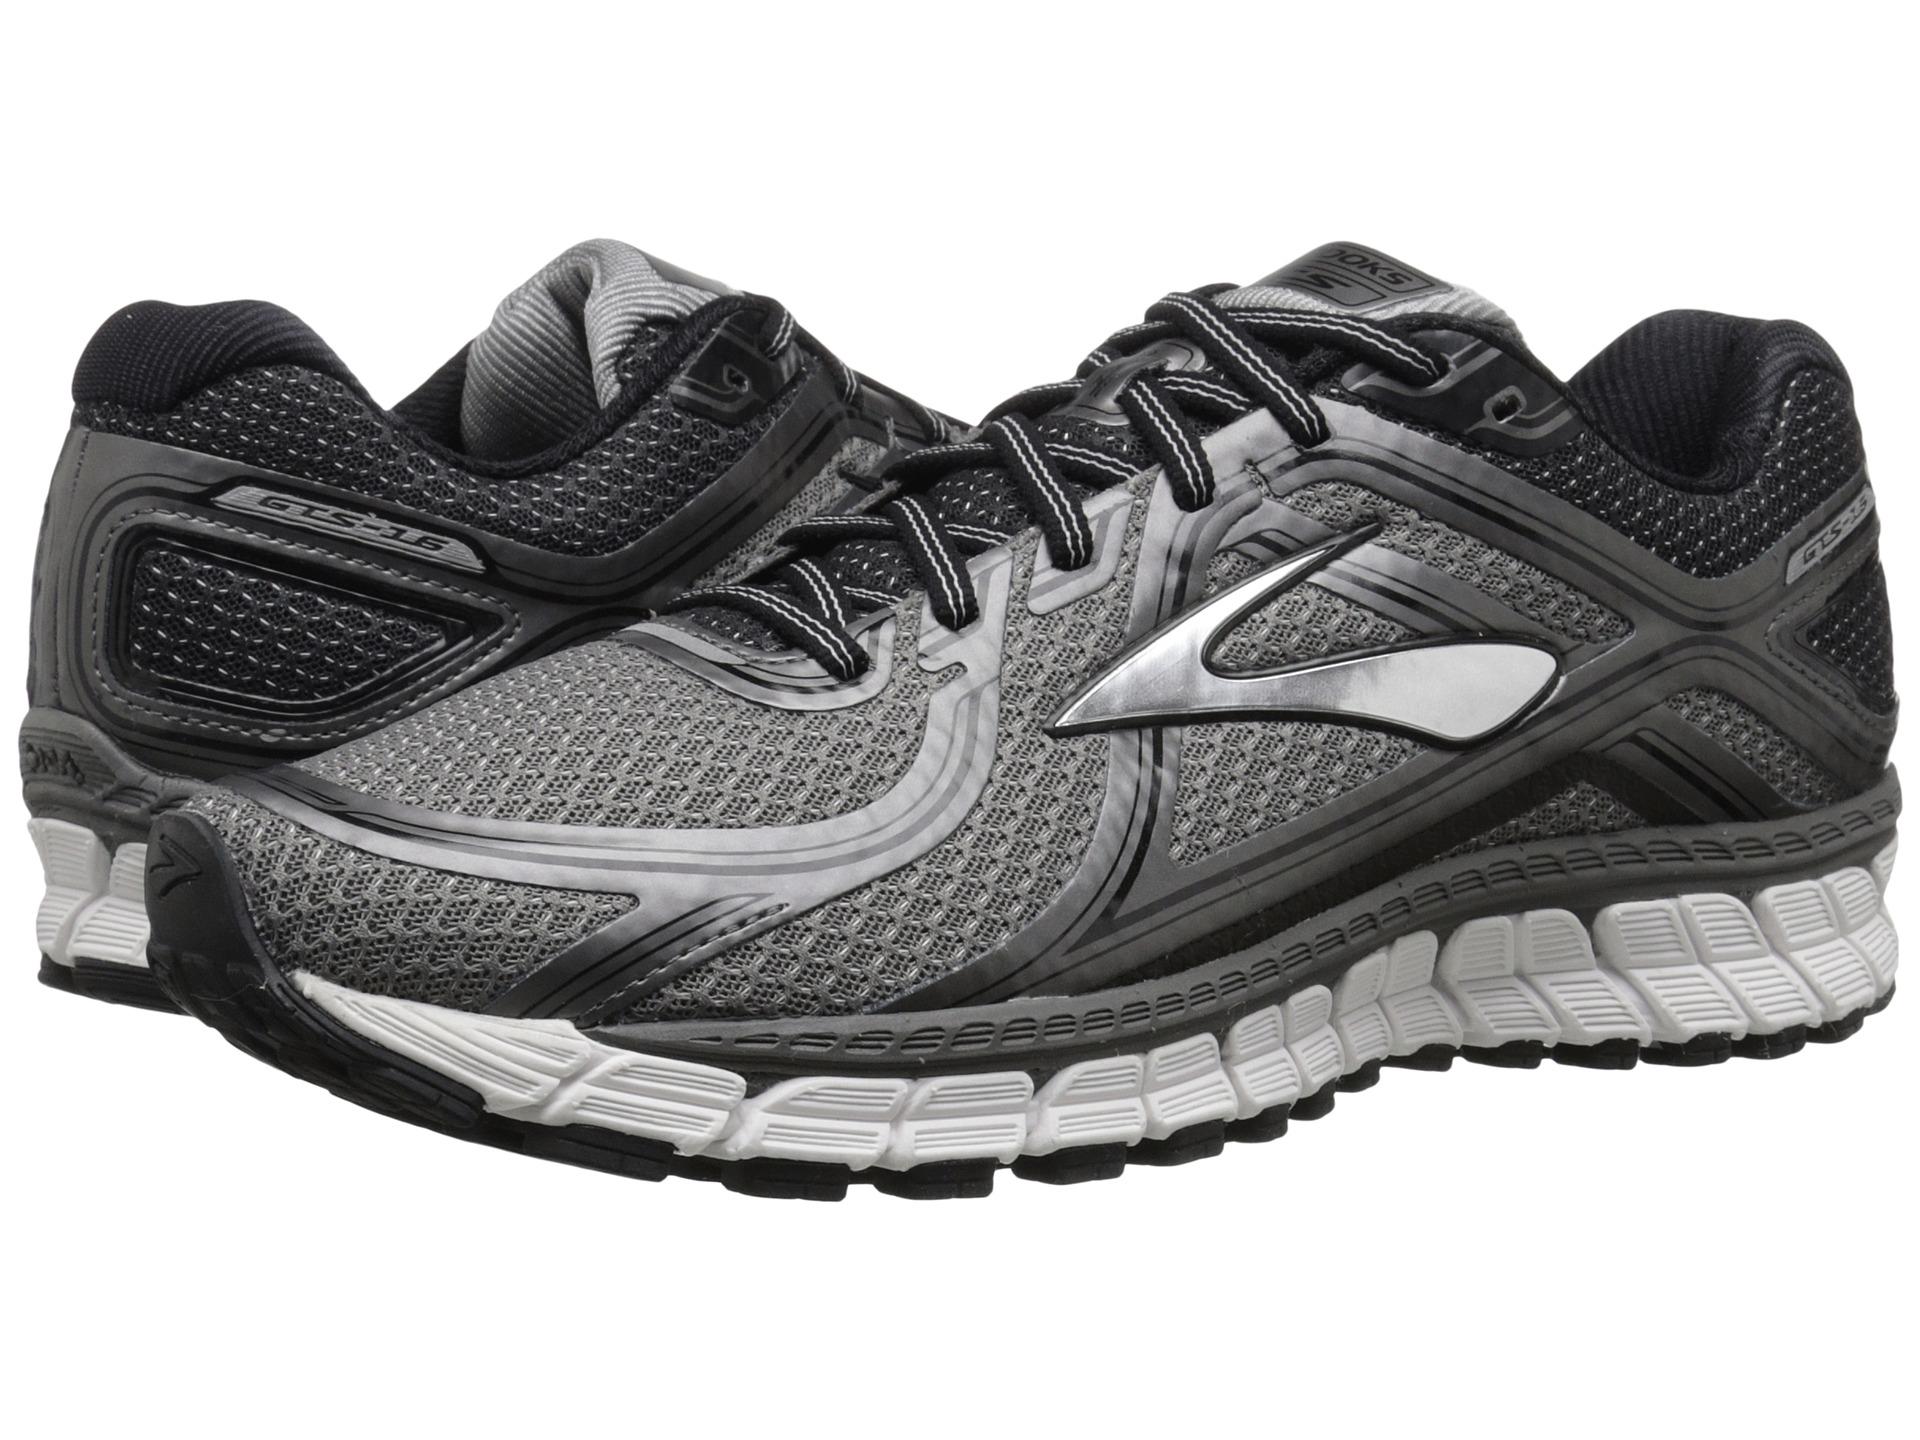 Brooks Adrenaline Gts 16 Running Shoes Men Black/Dark Grey